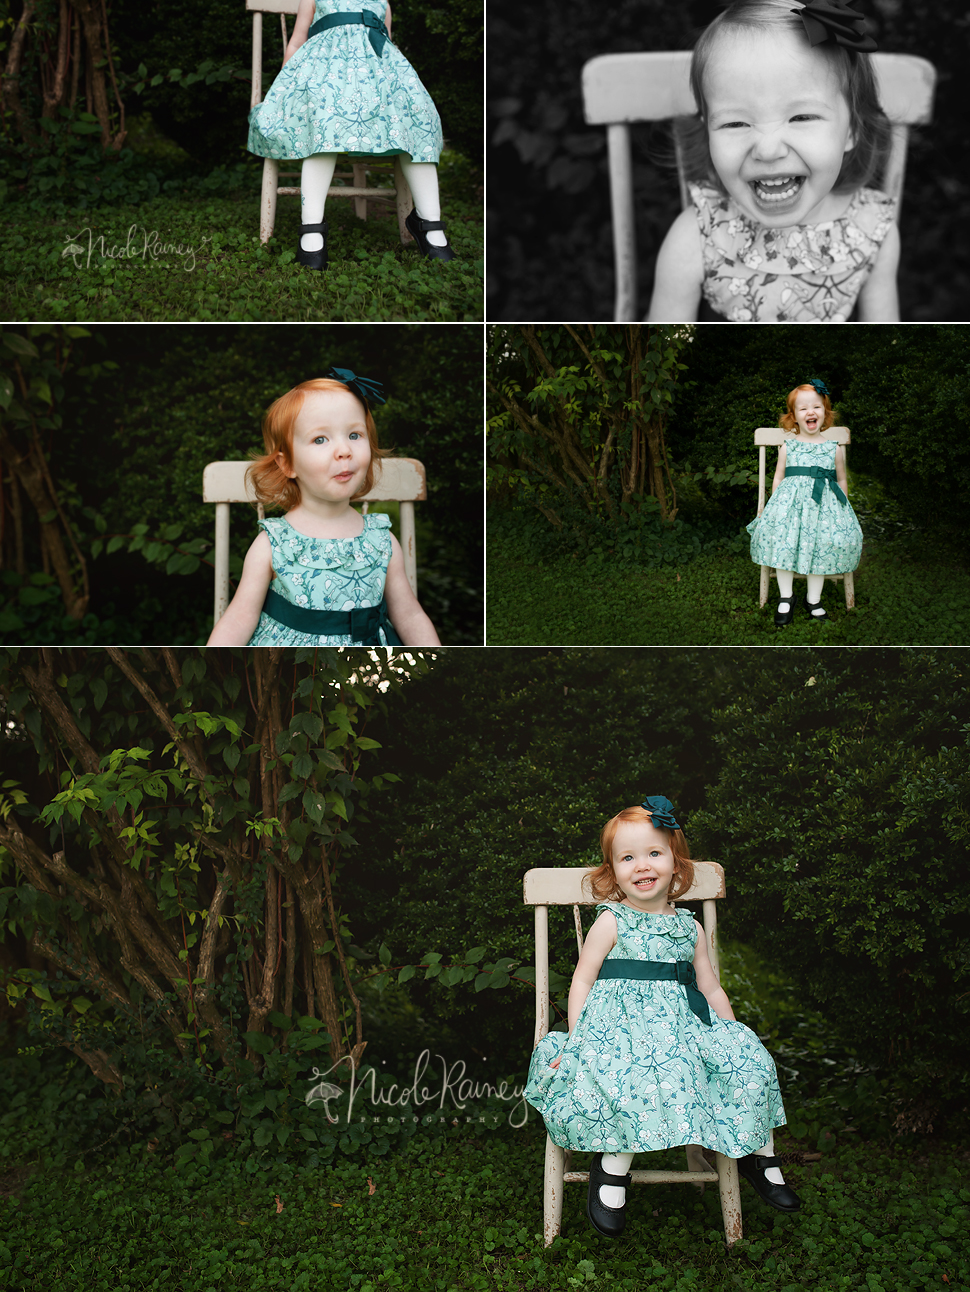 NicoleRaineyPhotography-EH2